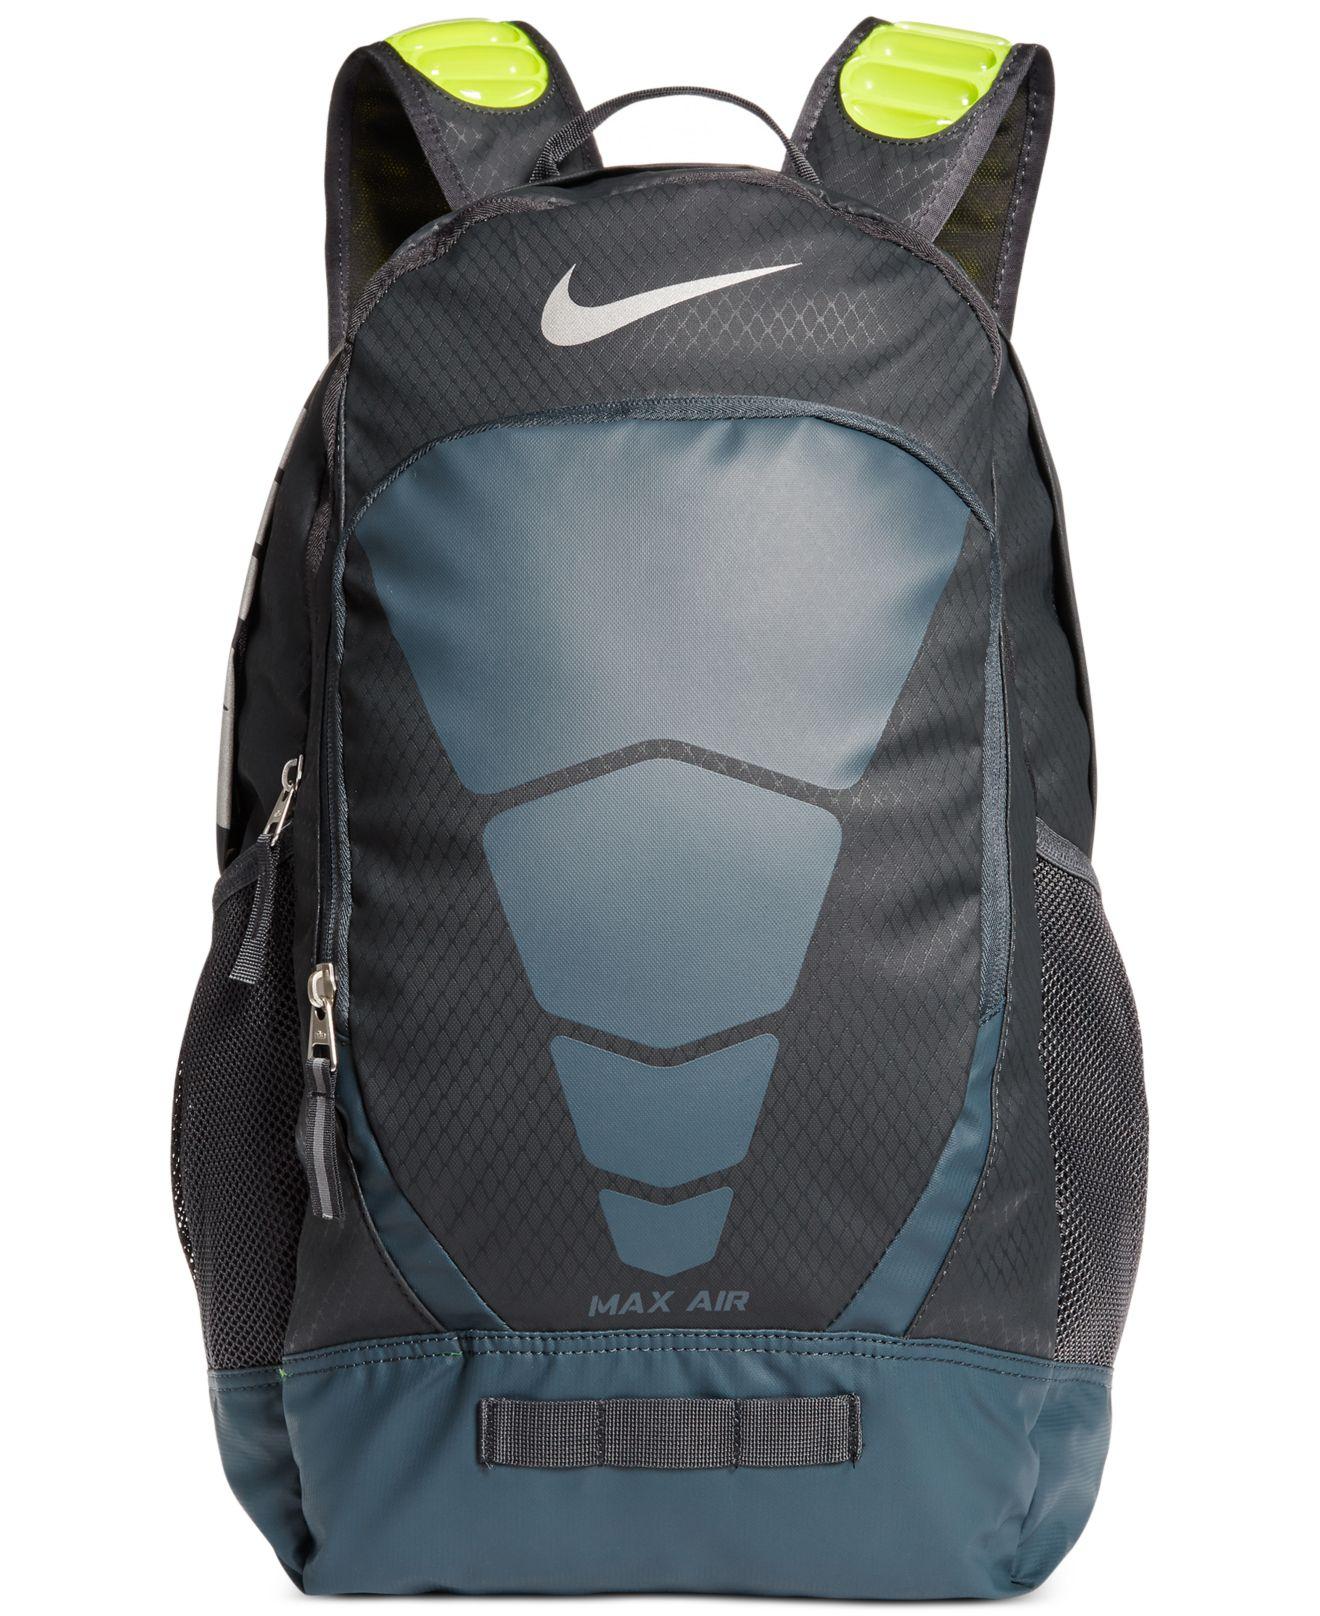 Nike Max Air Vapor Backpack in Gray for Men - Lyst